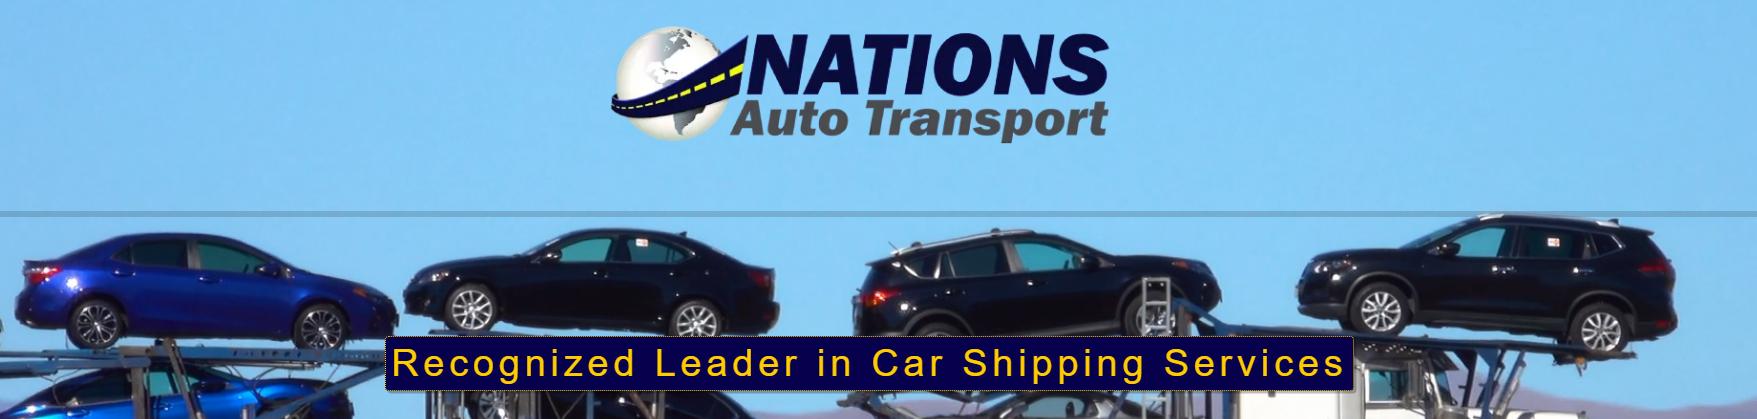 Nations Auto Transport reviews | Vehicle Shipping at 12032 East 46 Terrace - Kansas City MO